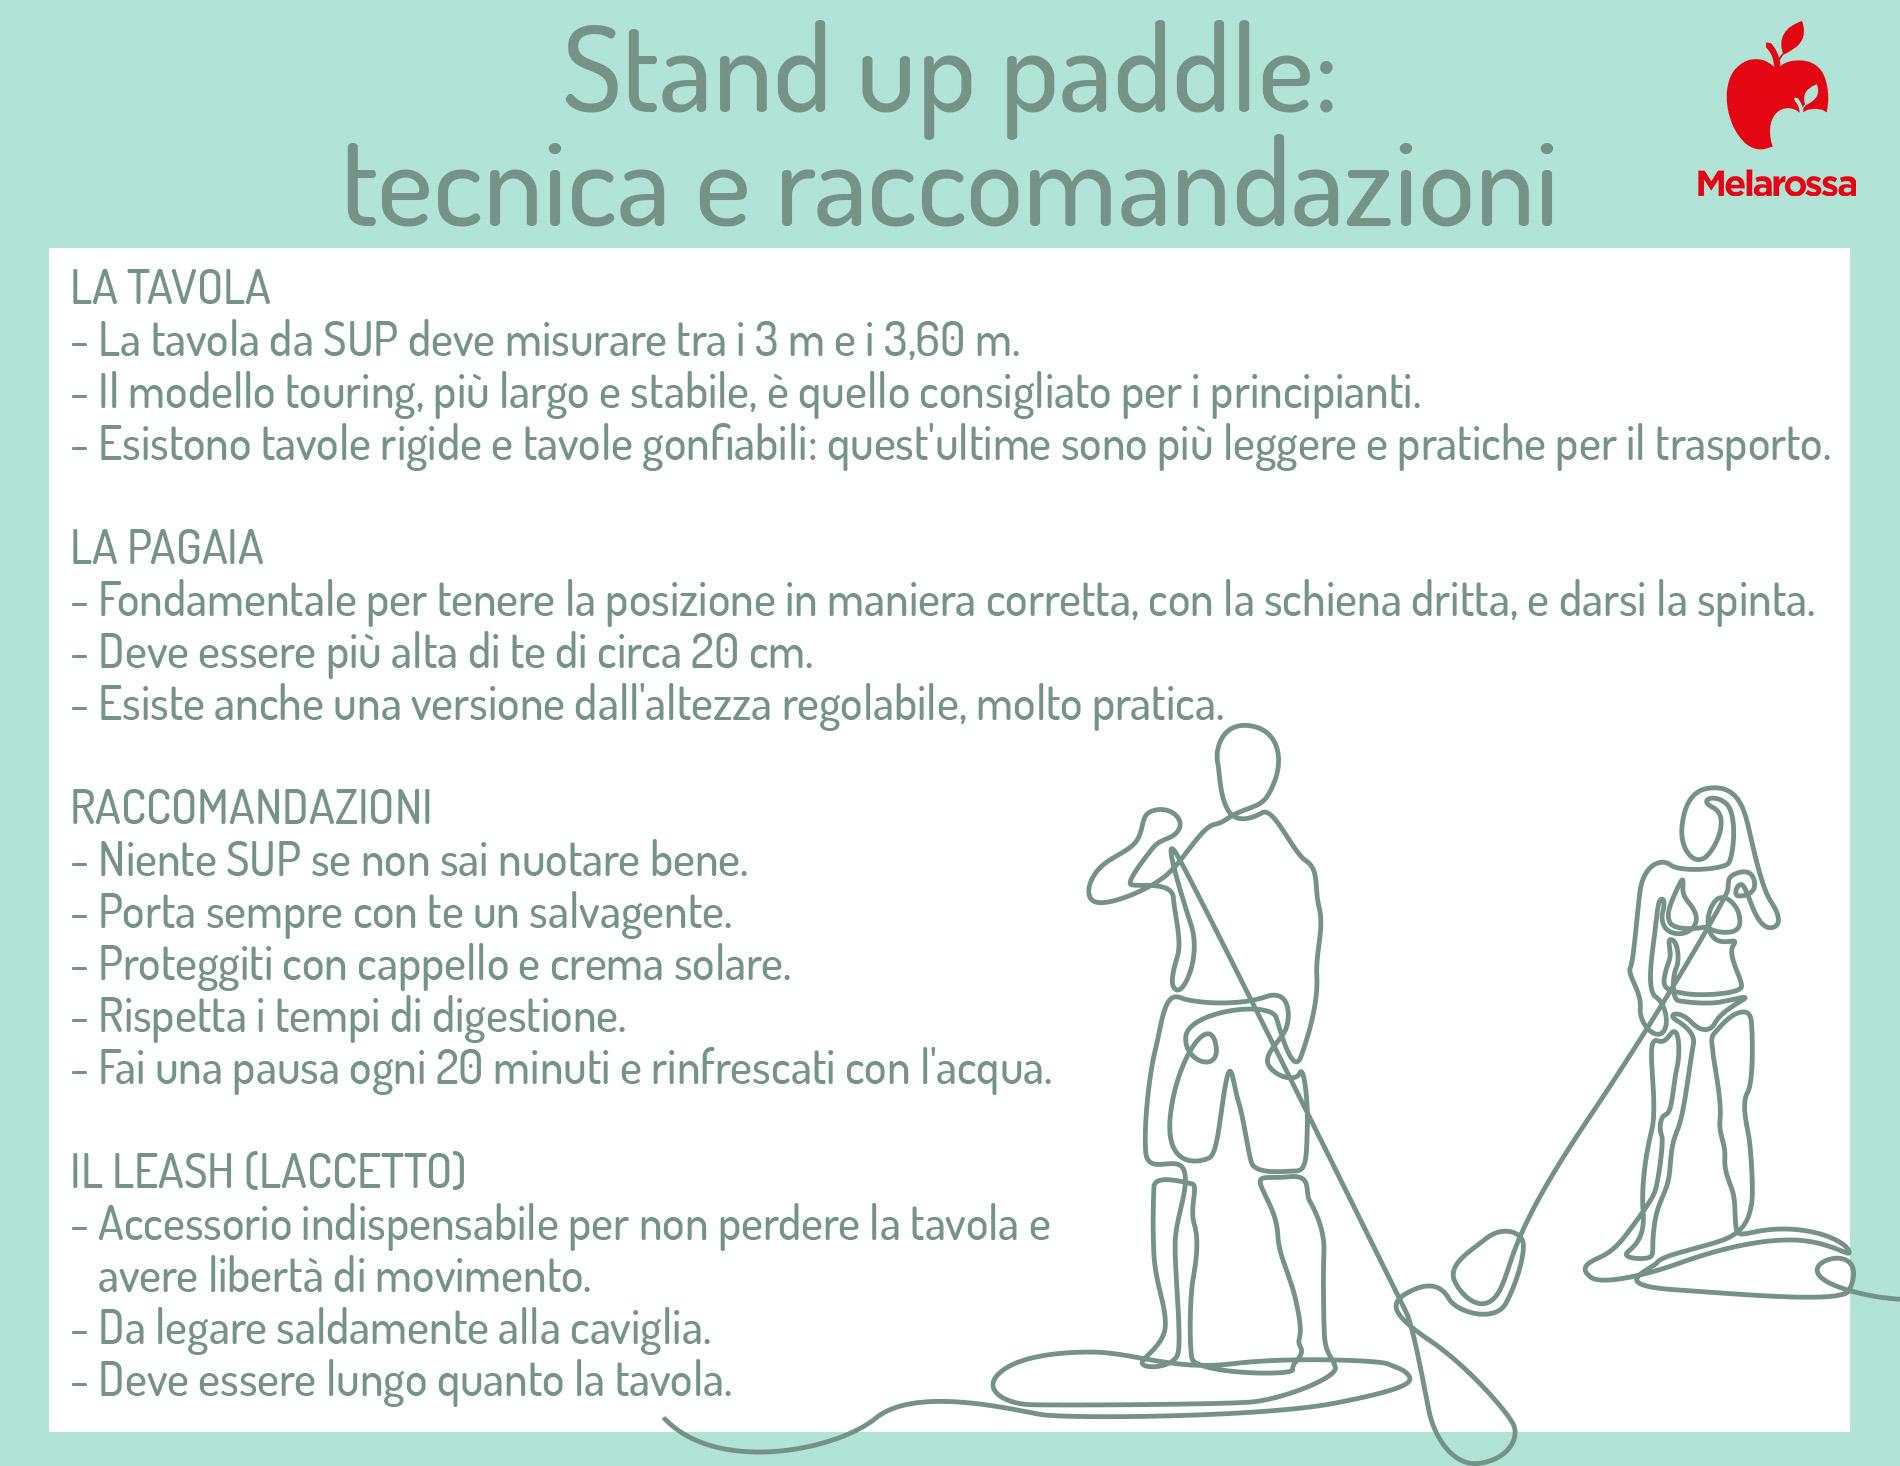 stand up paddle tecnica e raccomandazioni